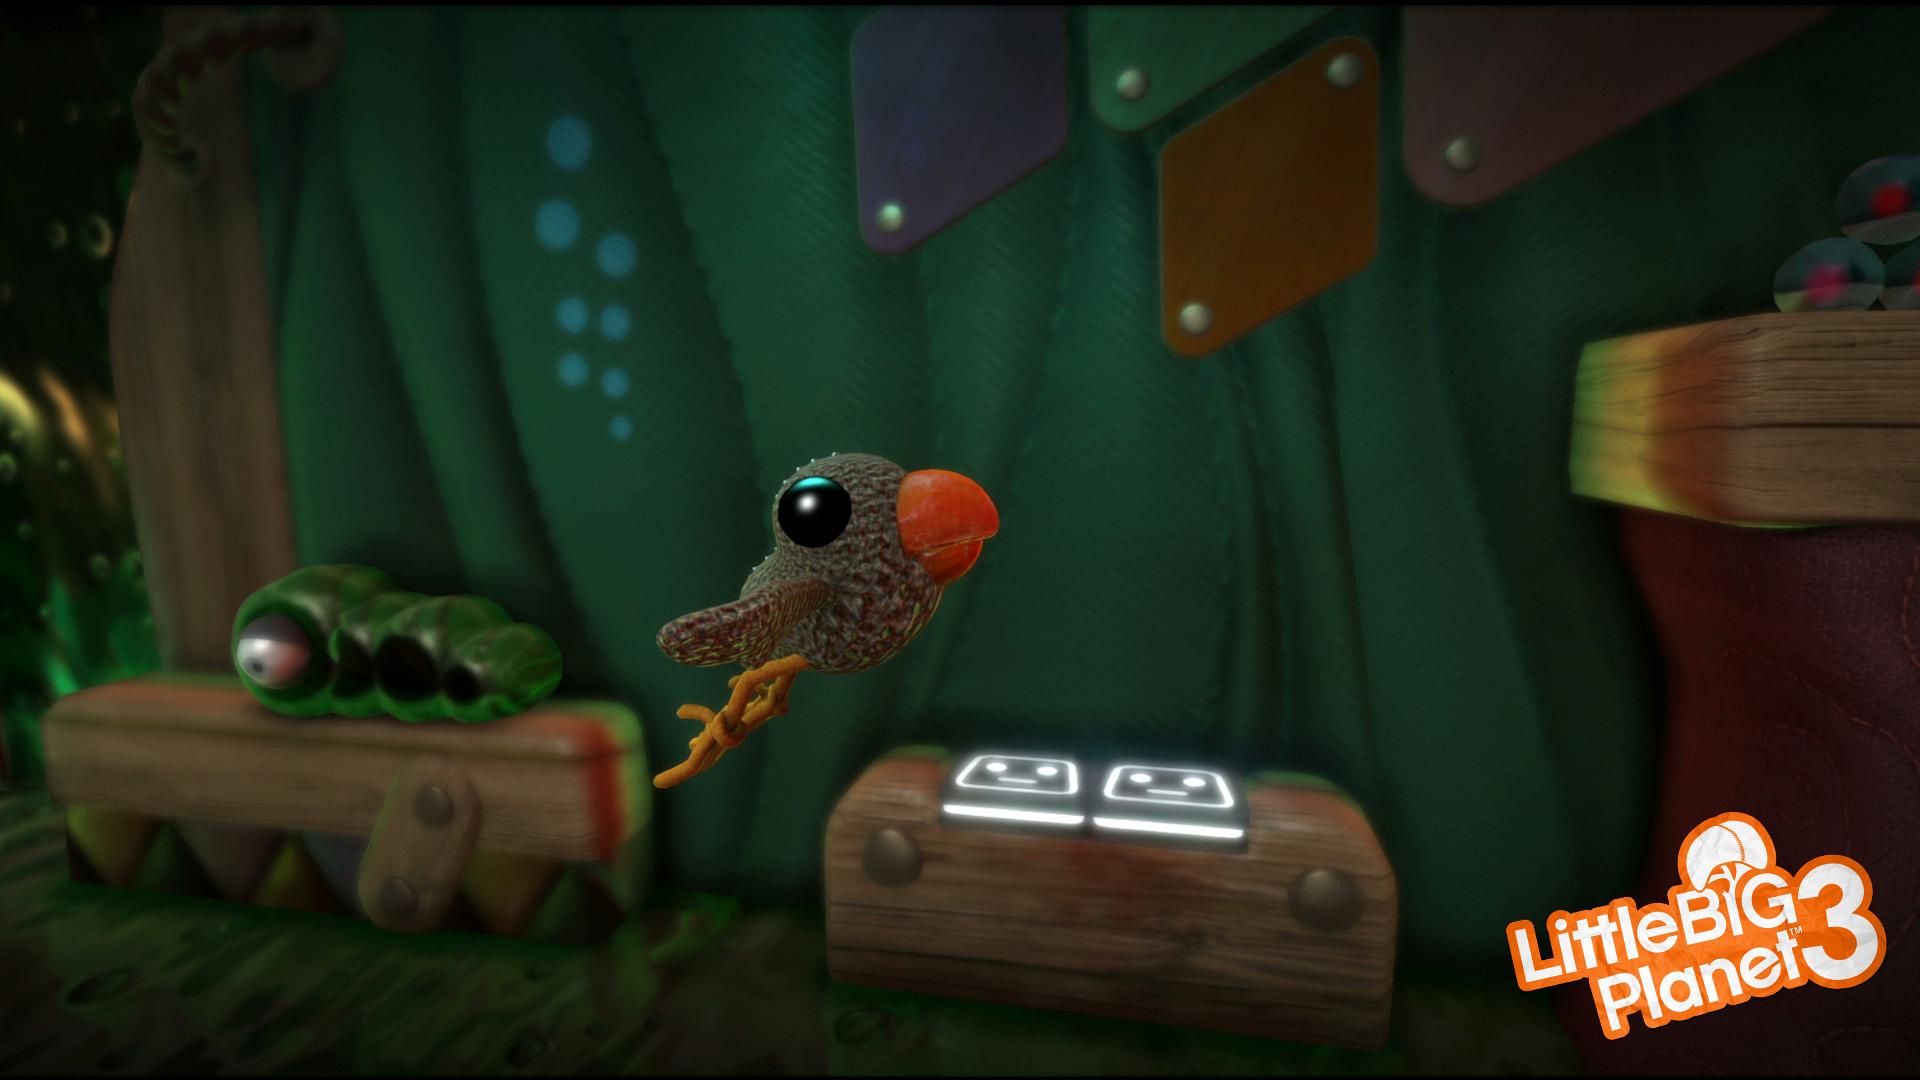 LittleBigPlanet3 PS4 Editeur 020